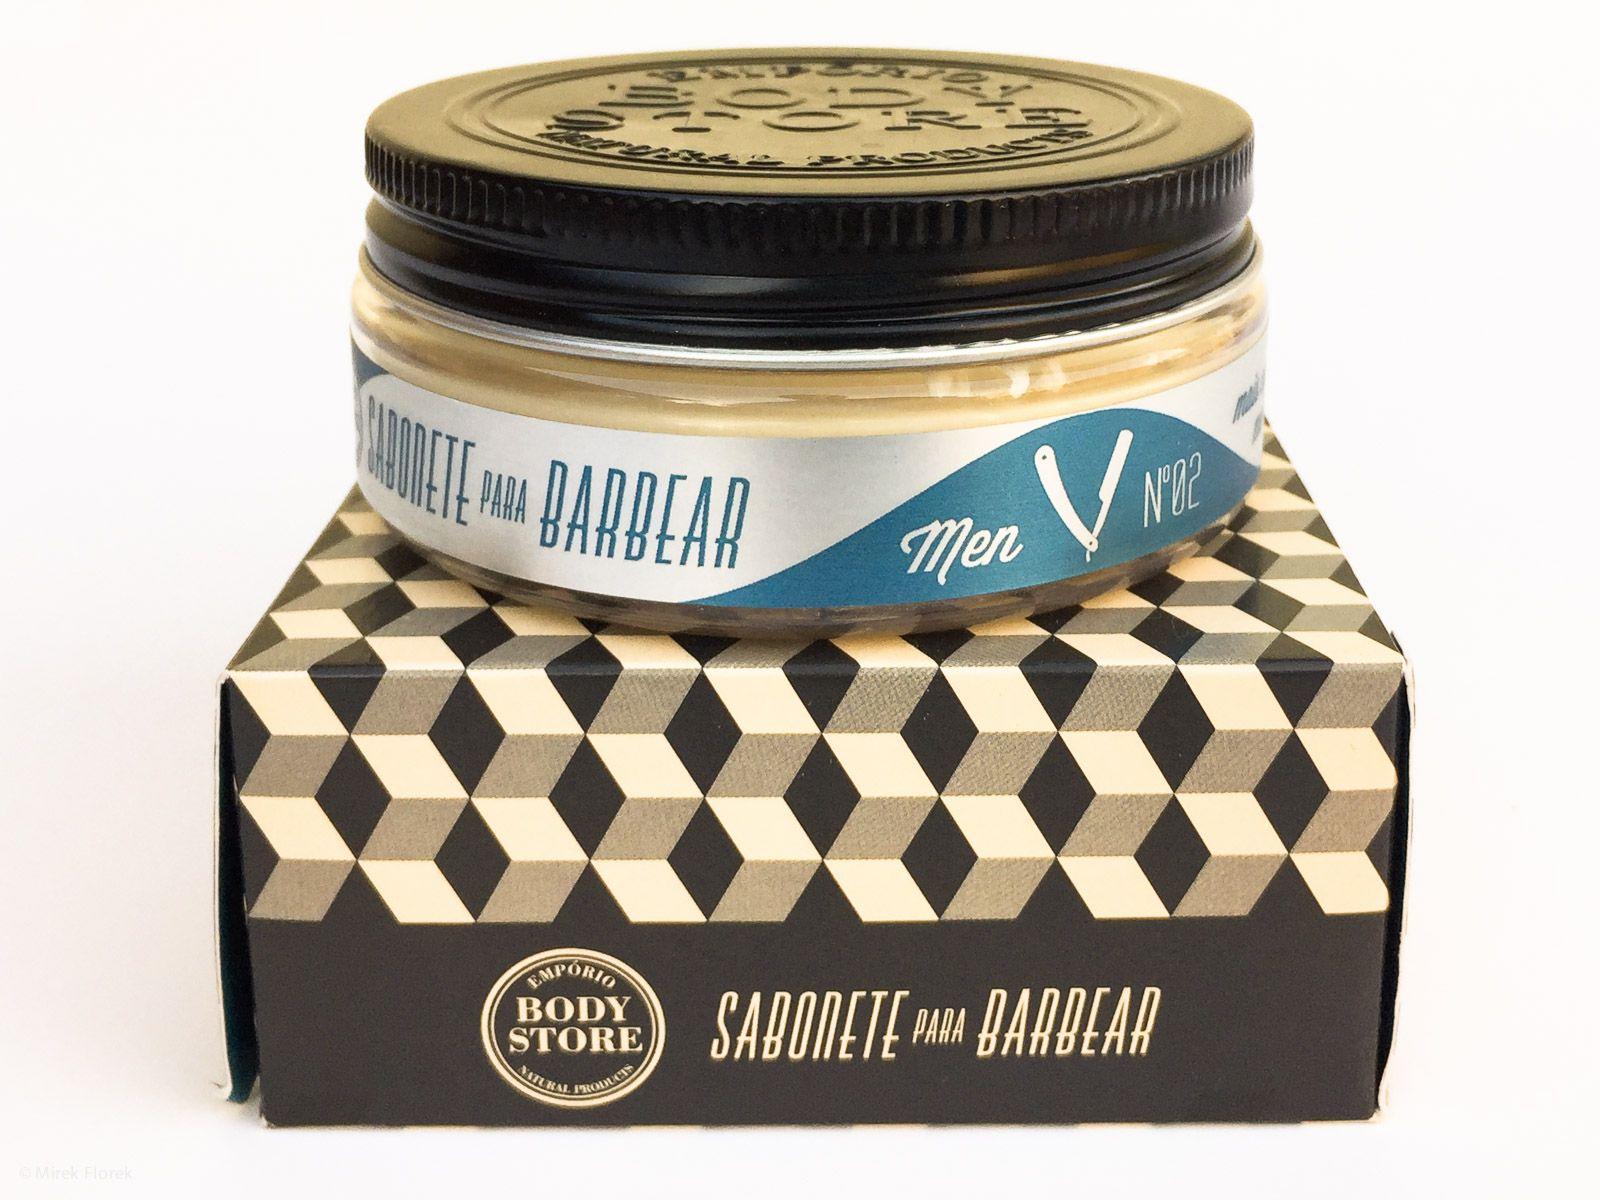 Opakowanie mydła do golenia The Body Store Sabonete para Barbear